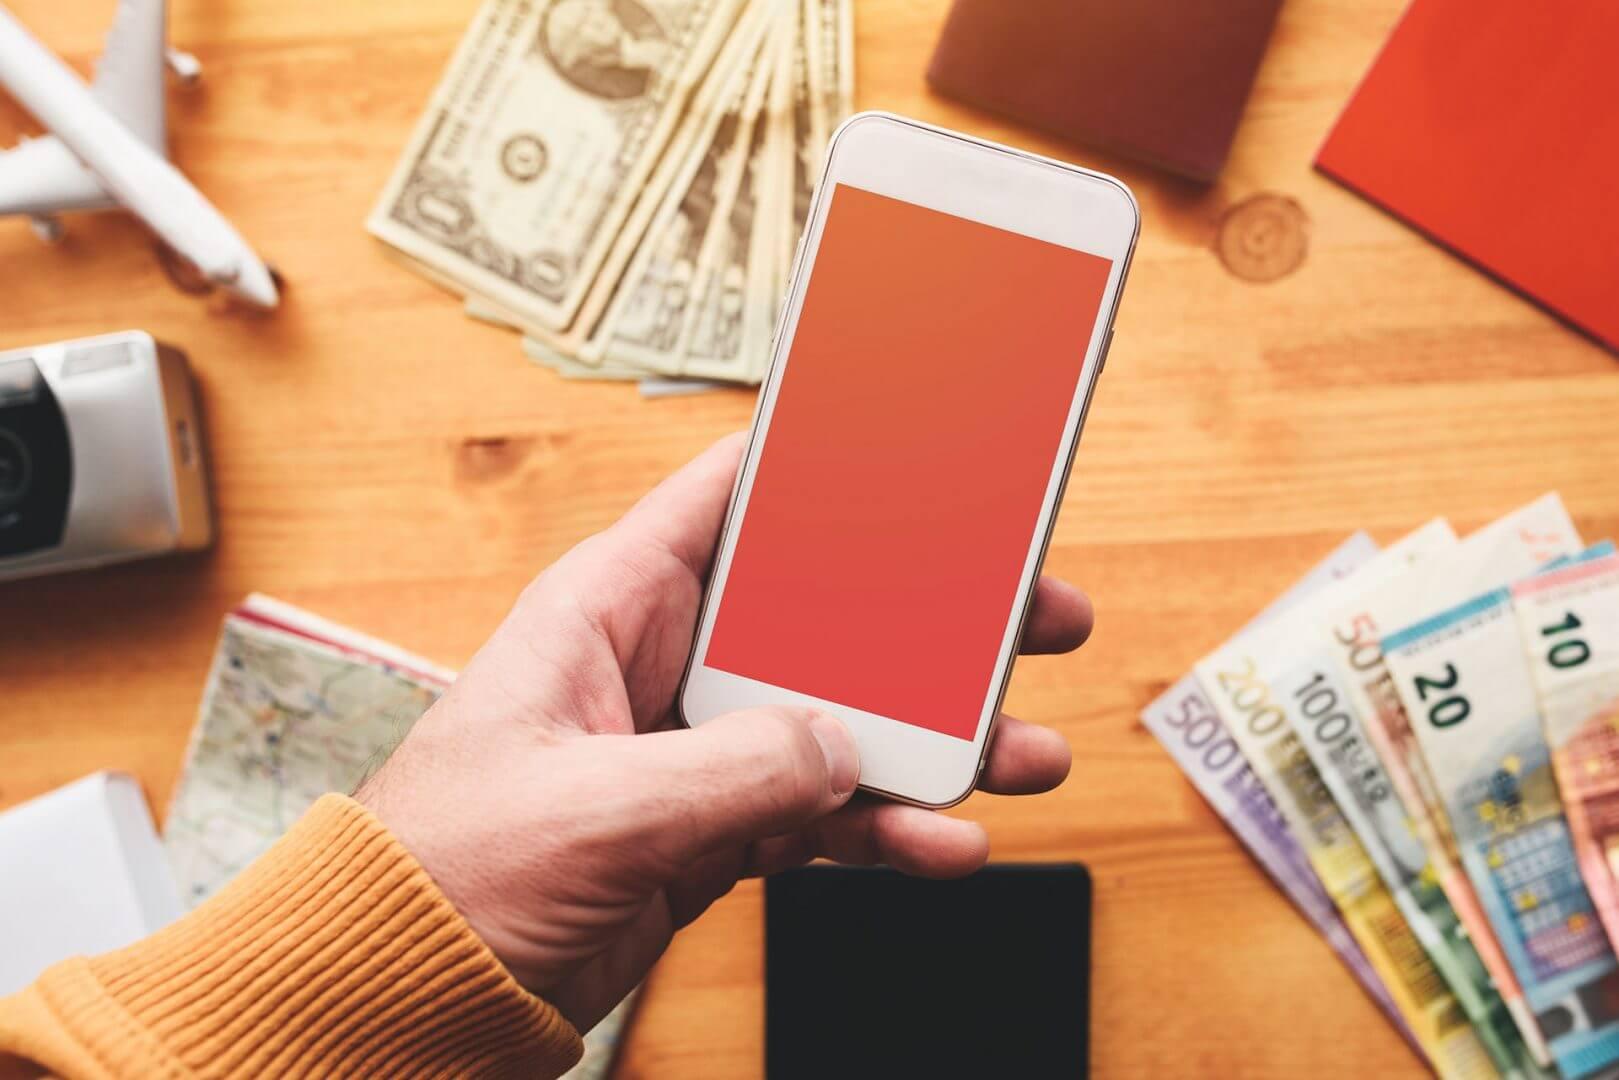 App programmieren lassen - Die Kosten